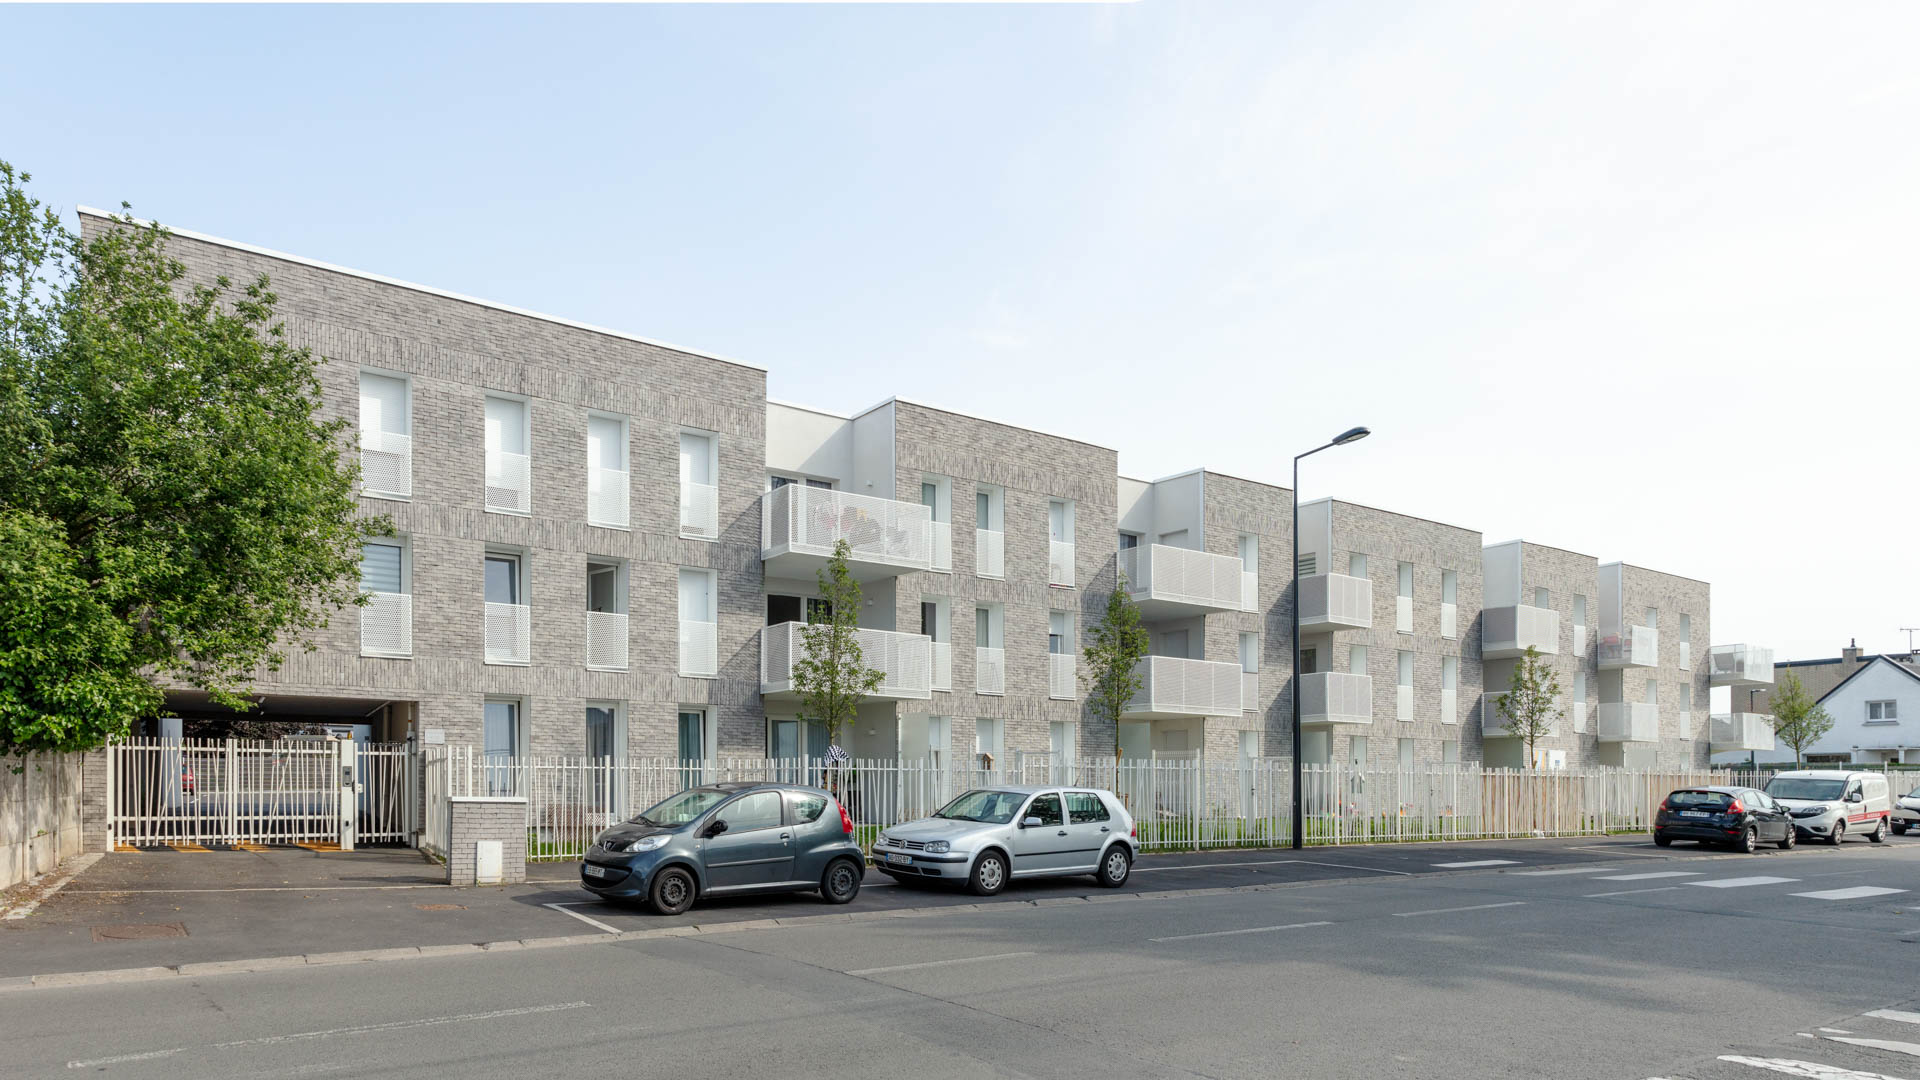 LDKphoto - Rue Henri Barbuse - Fache Thumesnil - 36.jpg